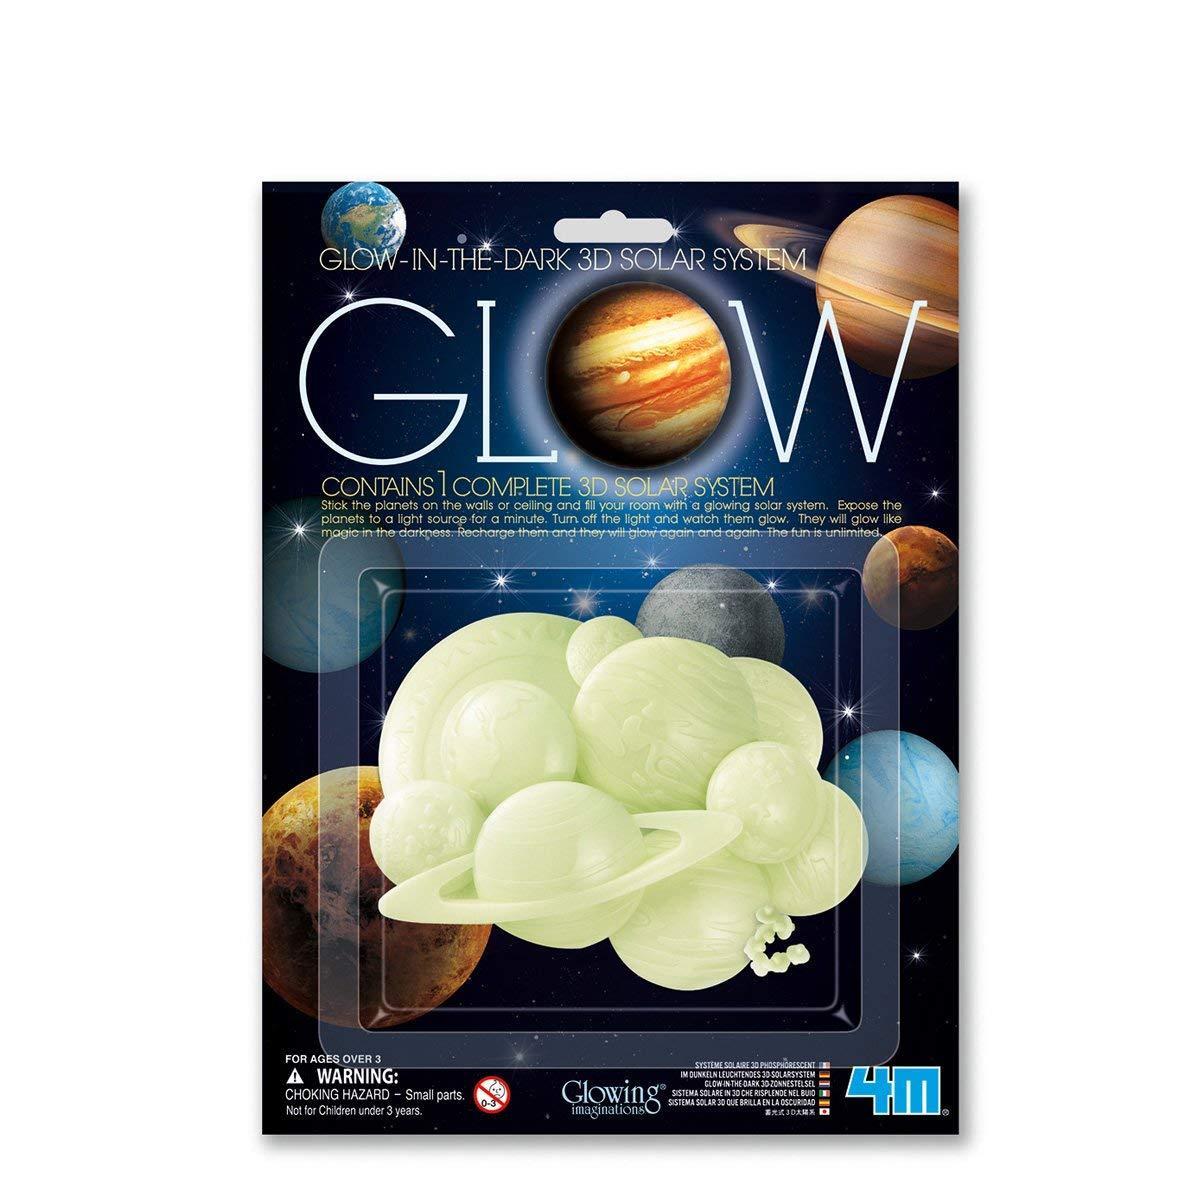 SISTEMA SOLARE 3D - GLOW